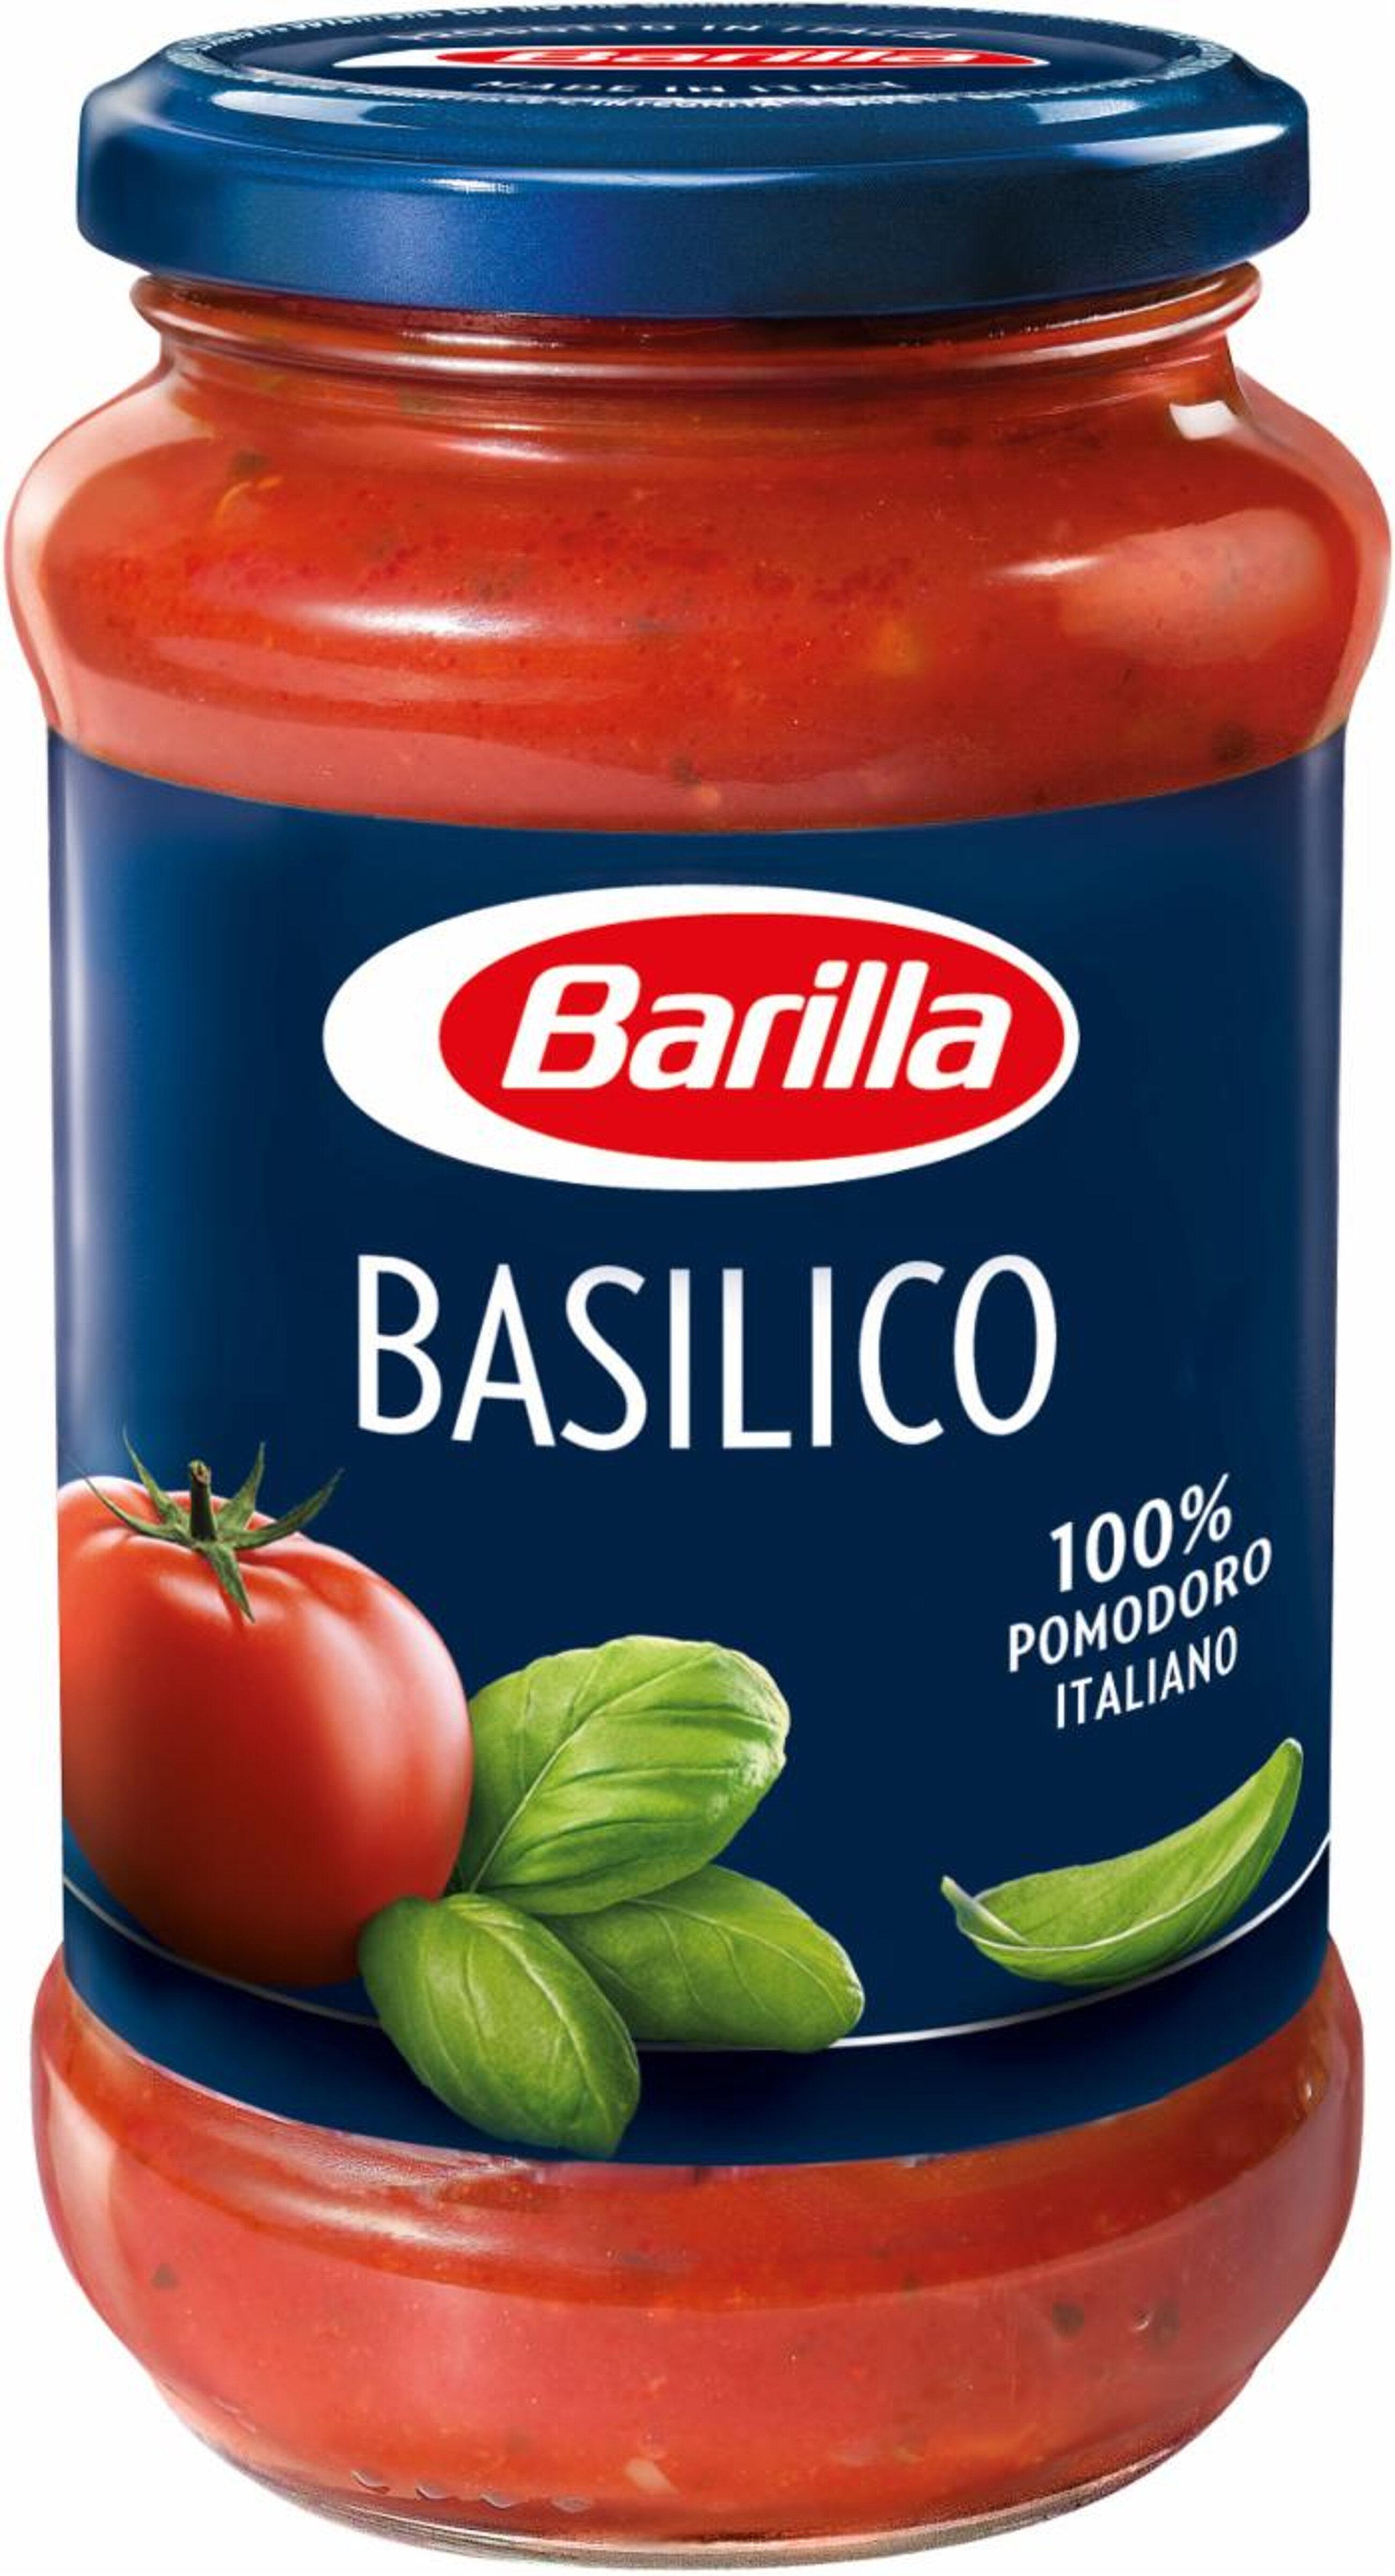 Barilla sauce tomates basilic - Prodotto - fr